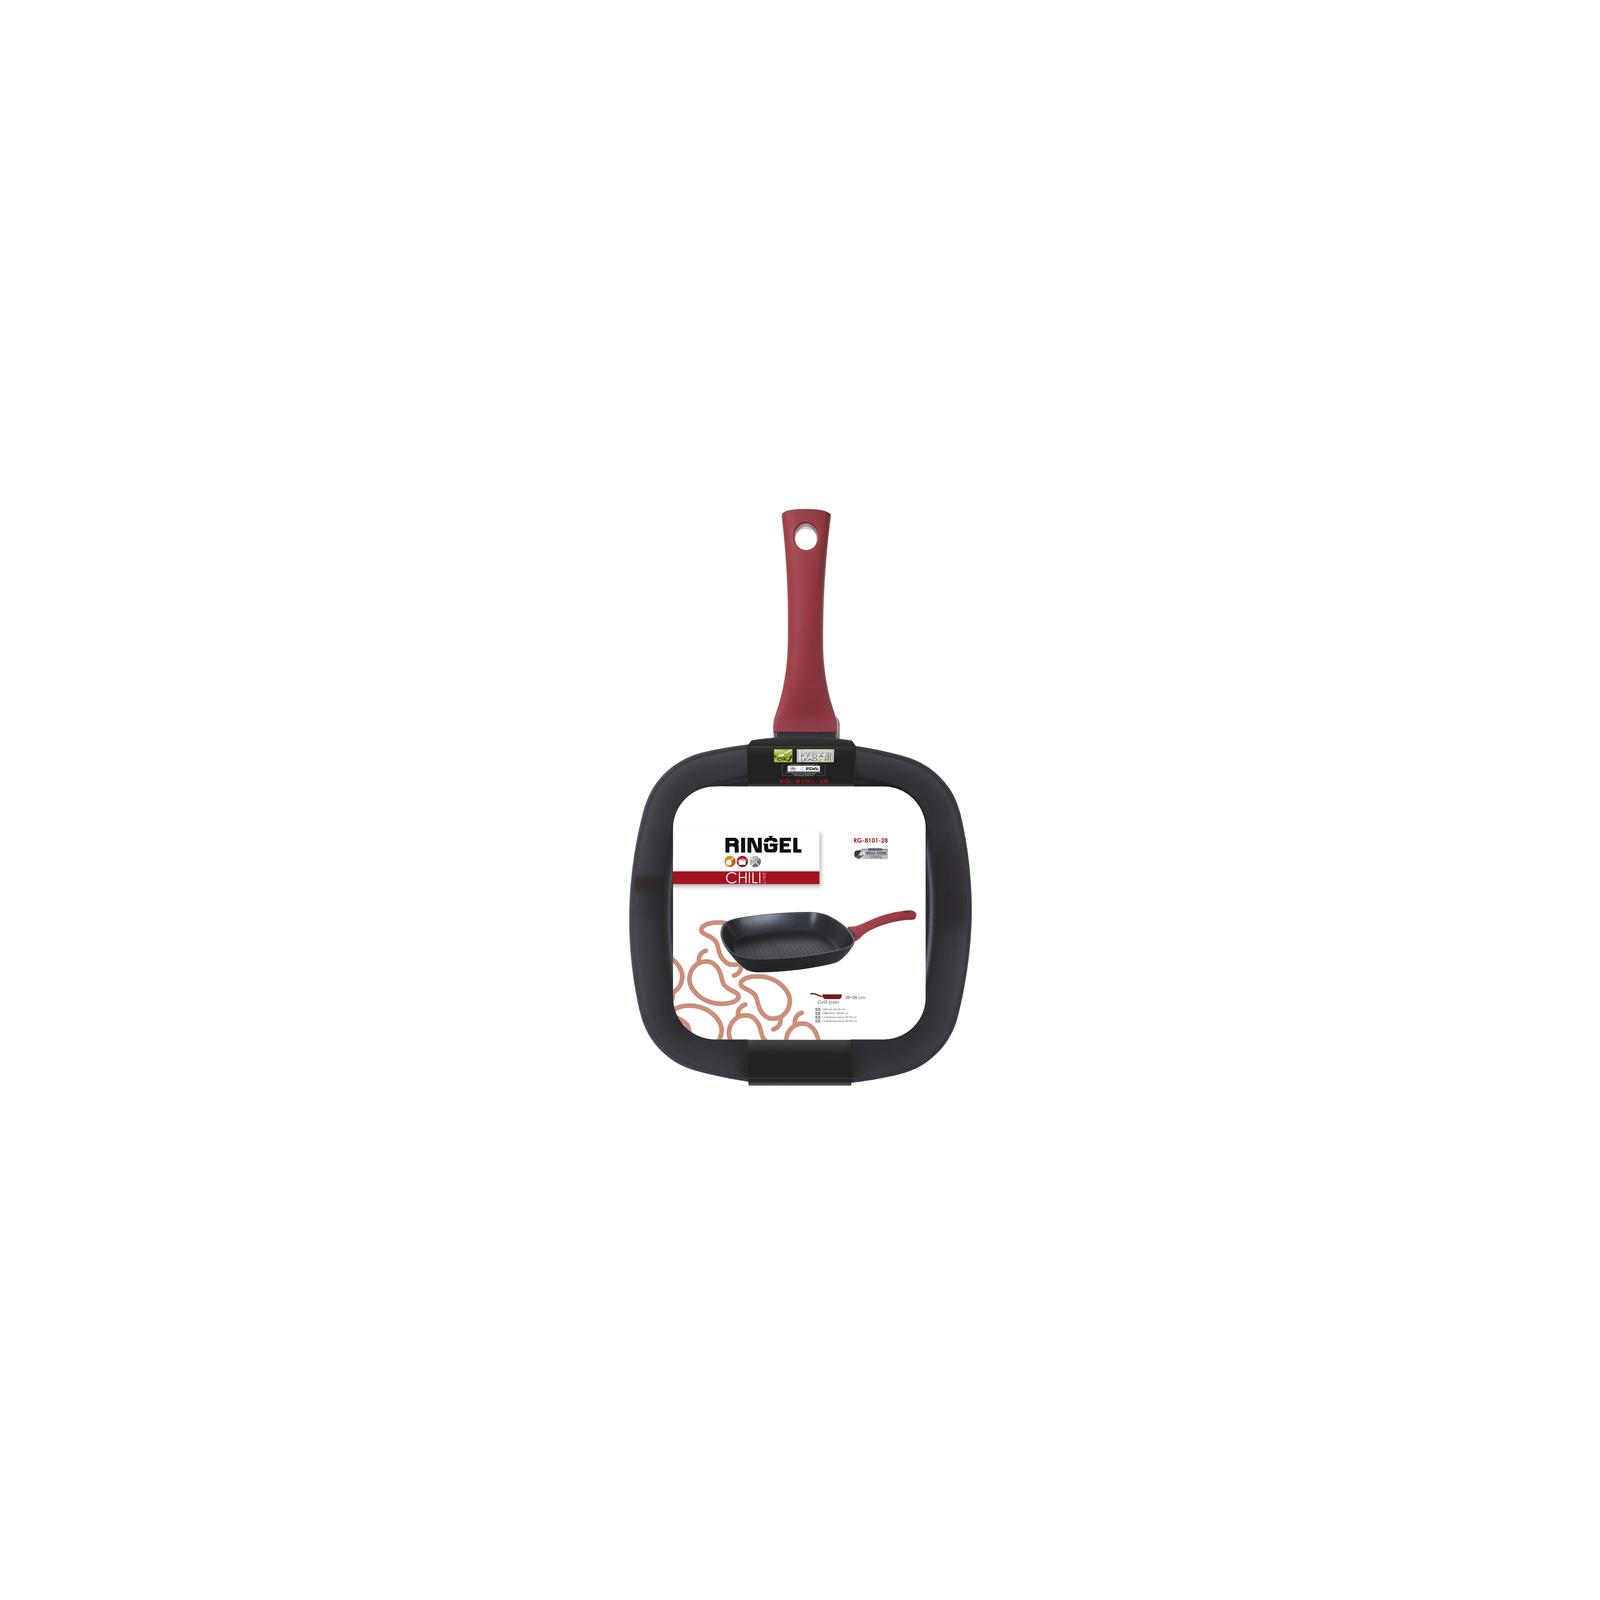 Сковорода Ringel Chili 28 х 28 см (RG-8101-28) изображение 5